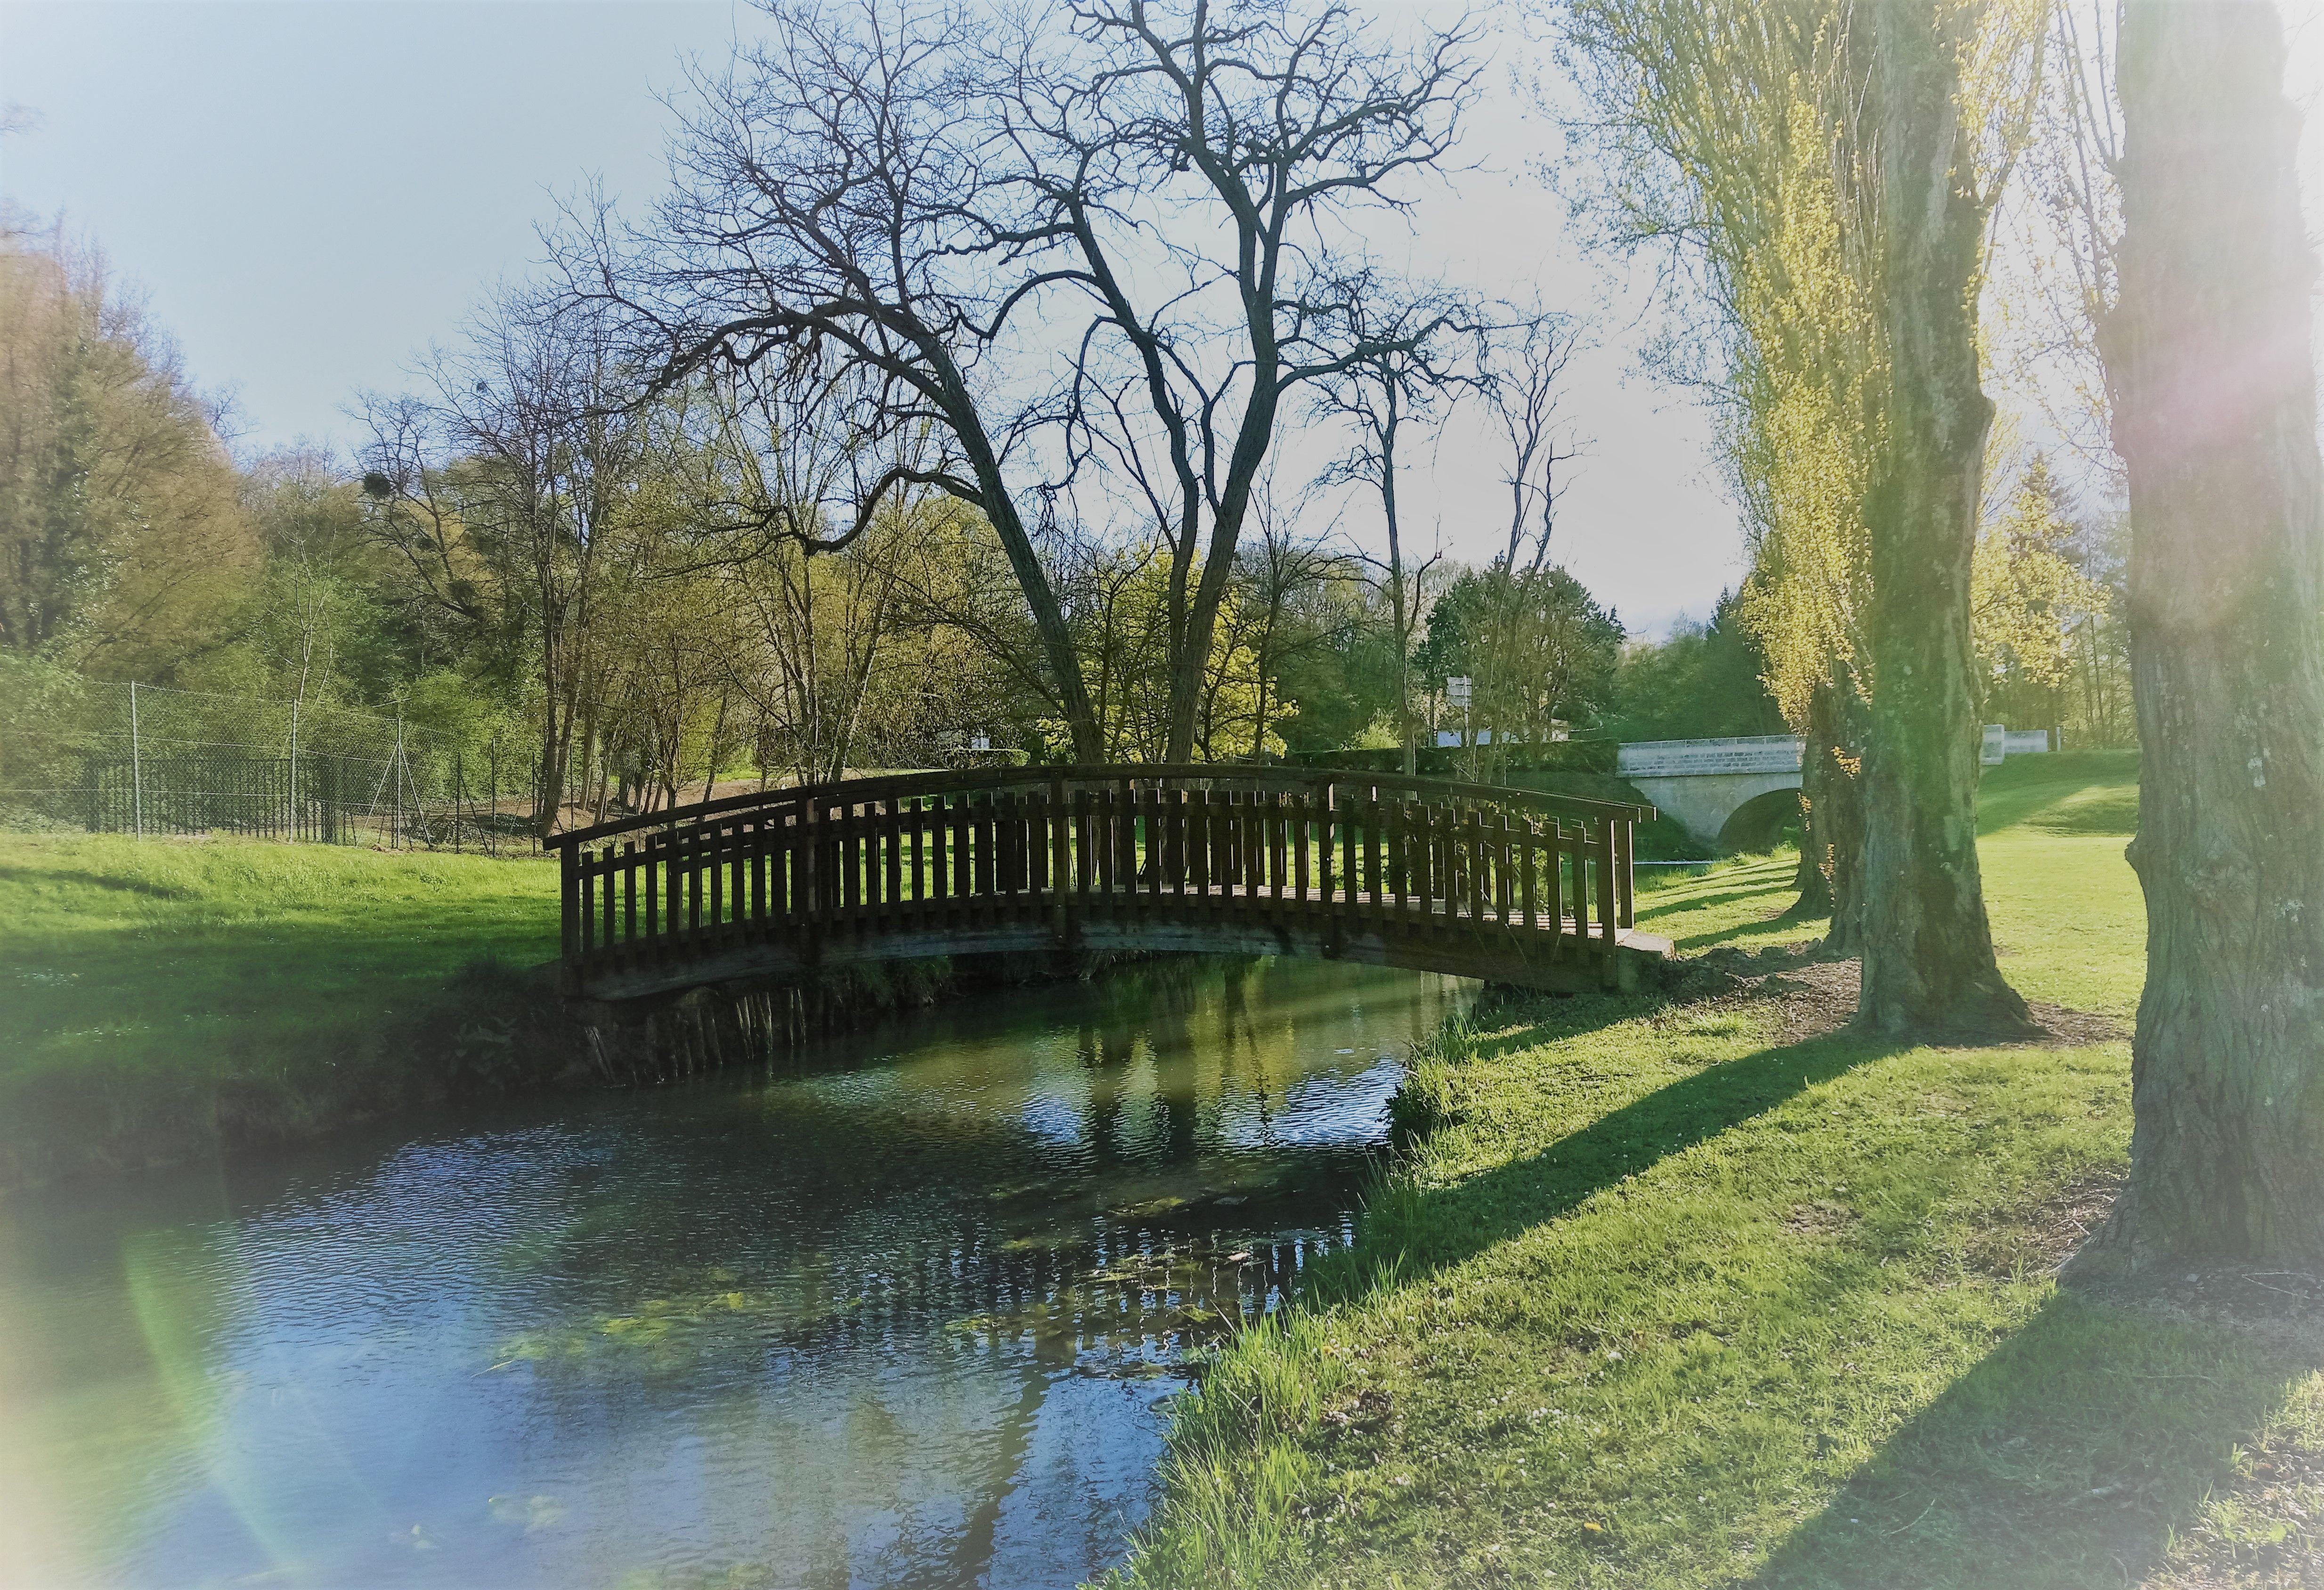 Le-Brignon-nature-promenade-le-long-de-l